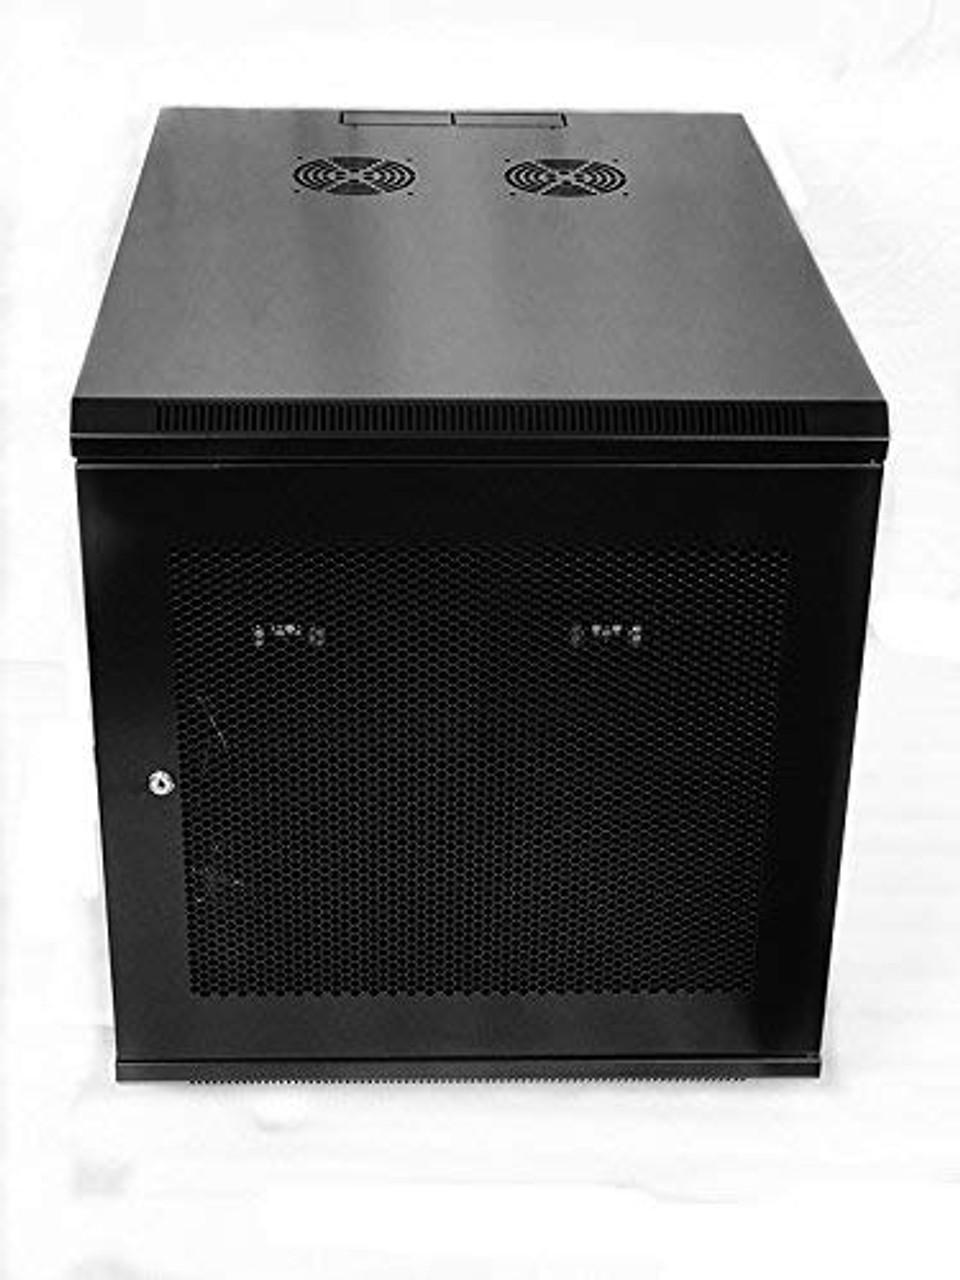 12u 800mm Depth Wall Mount Network Server Cabinet Rack Enclosure Meshed Door Lock Raising Electronics